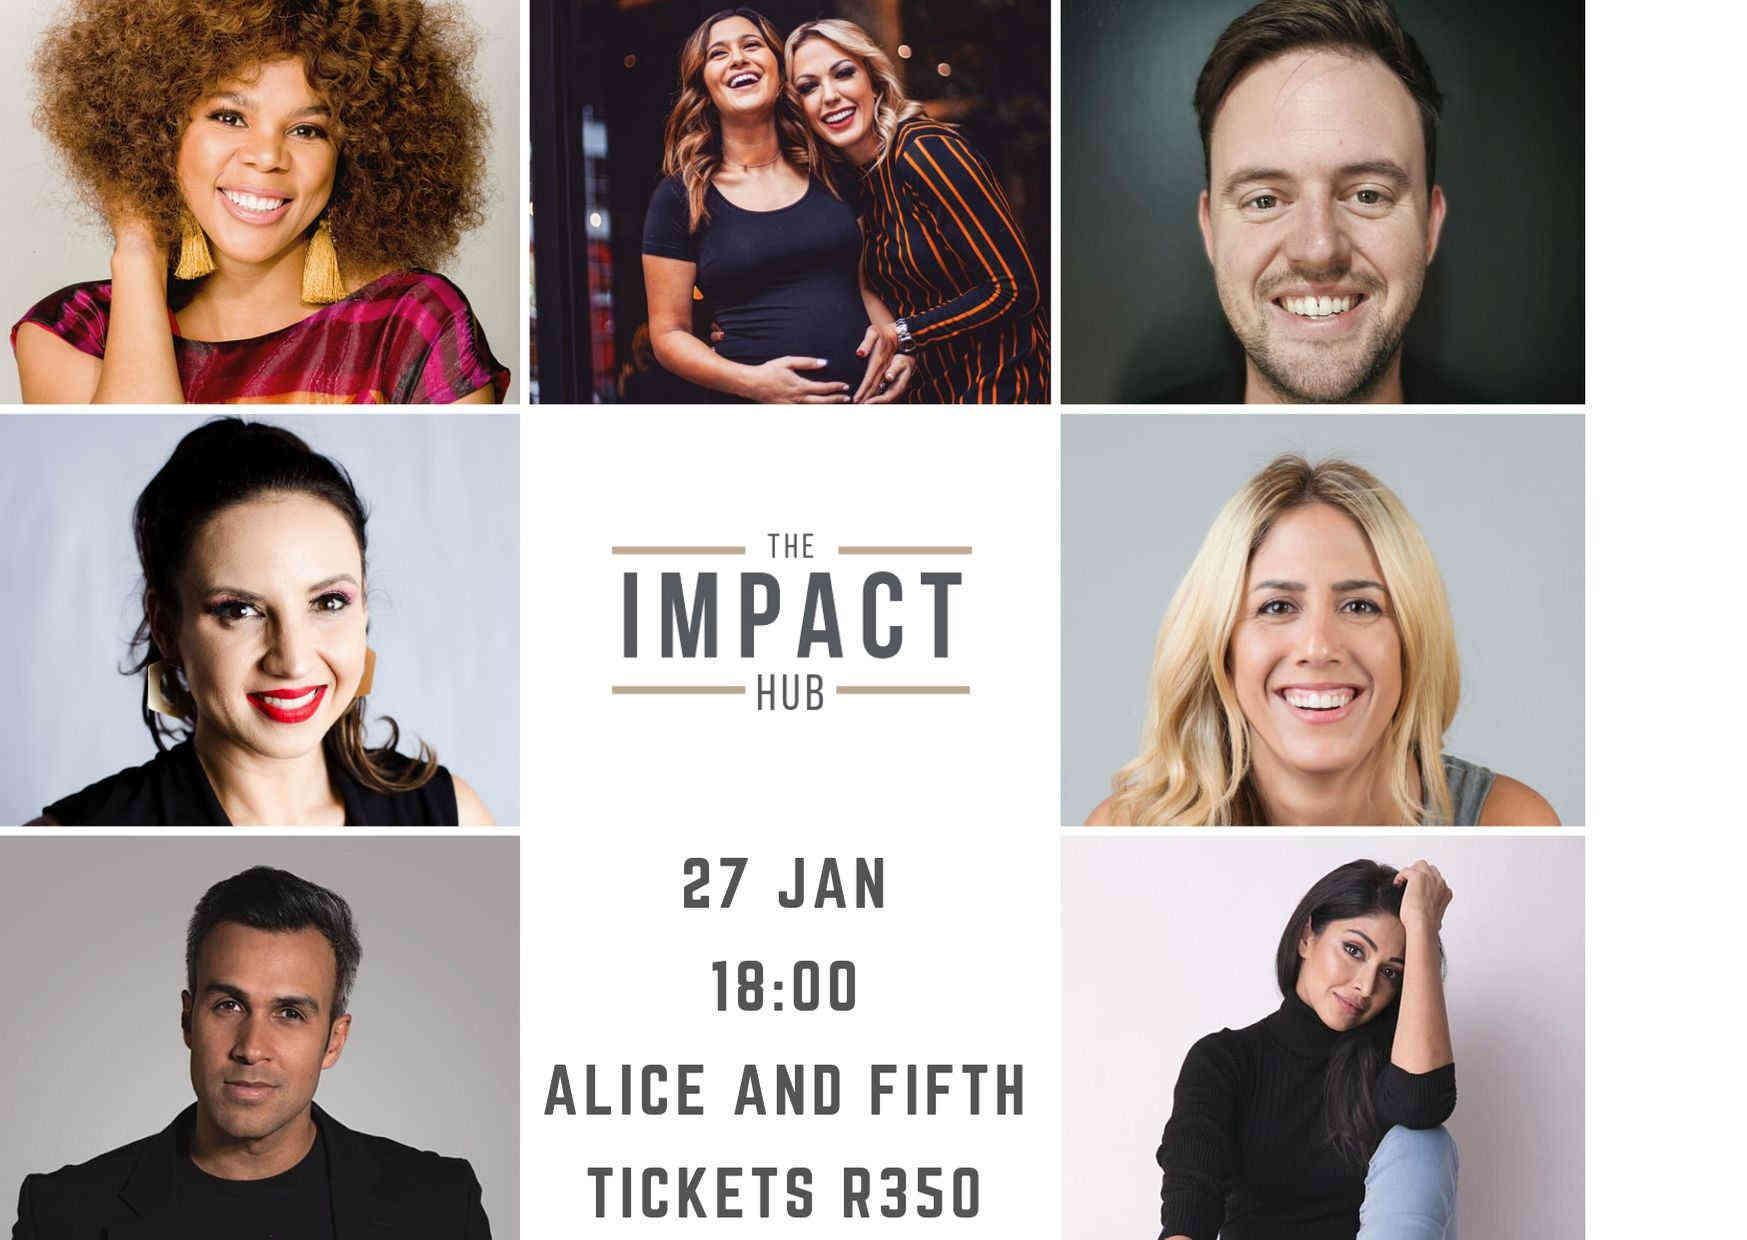 The Impact Hub Speakers